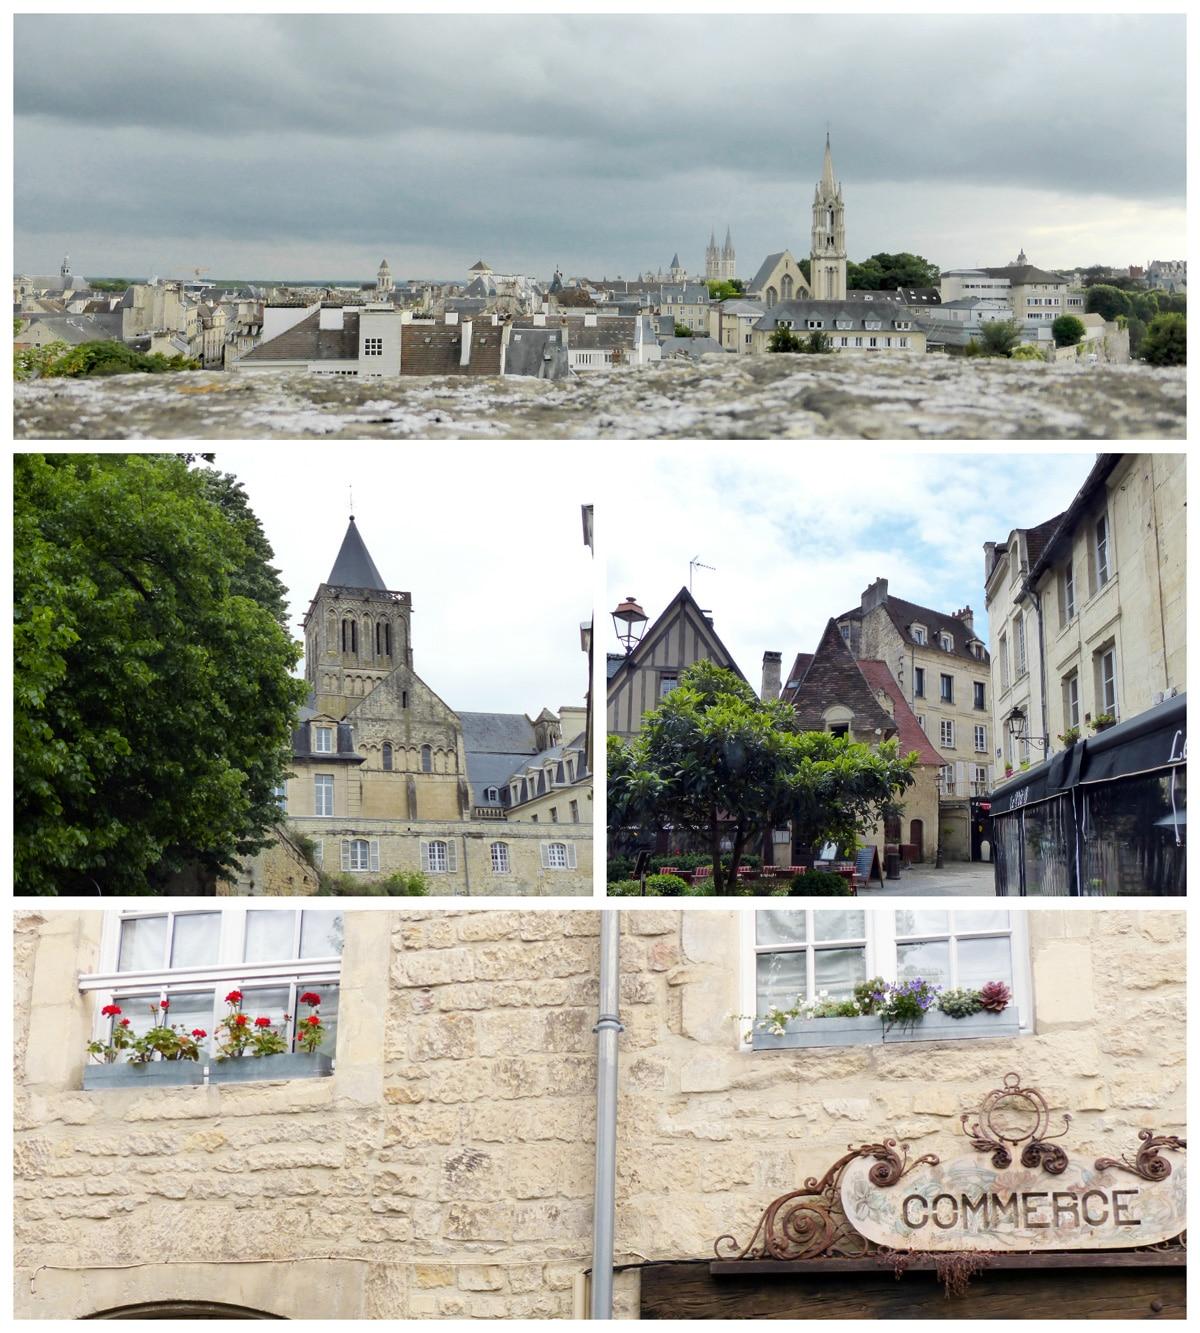 Decouvrir_Caen_Calvados_Normandie_VieuxCaen